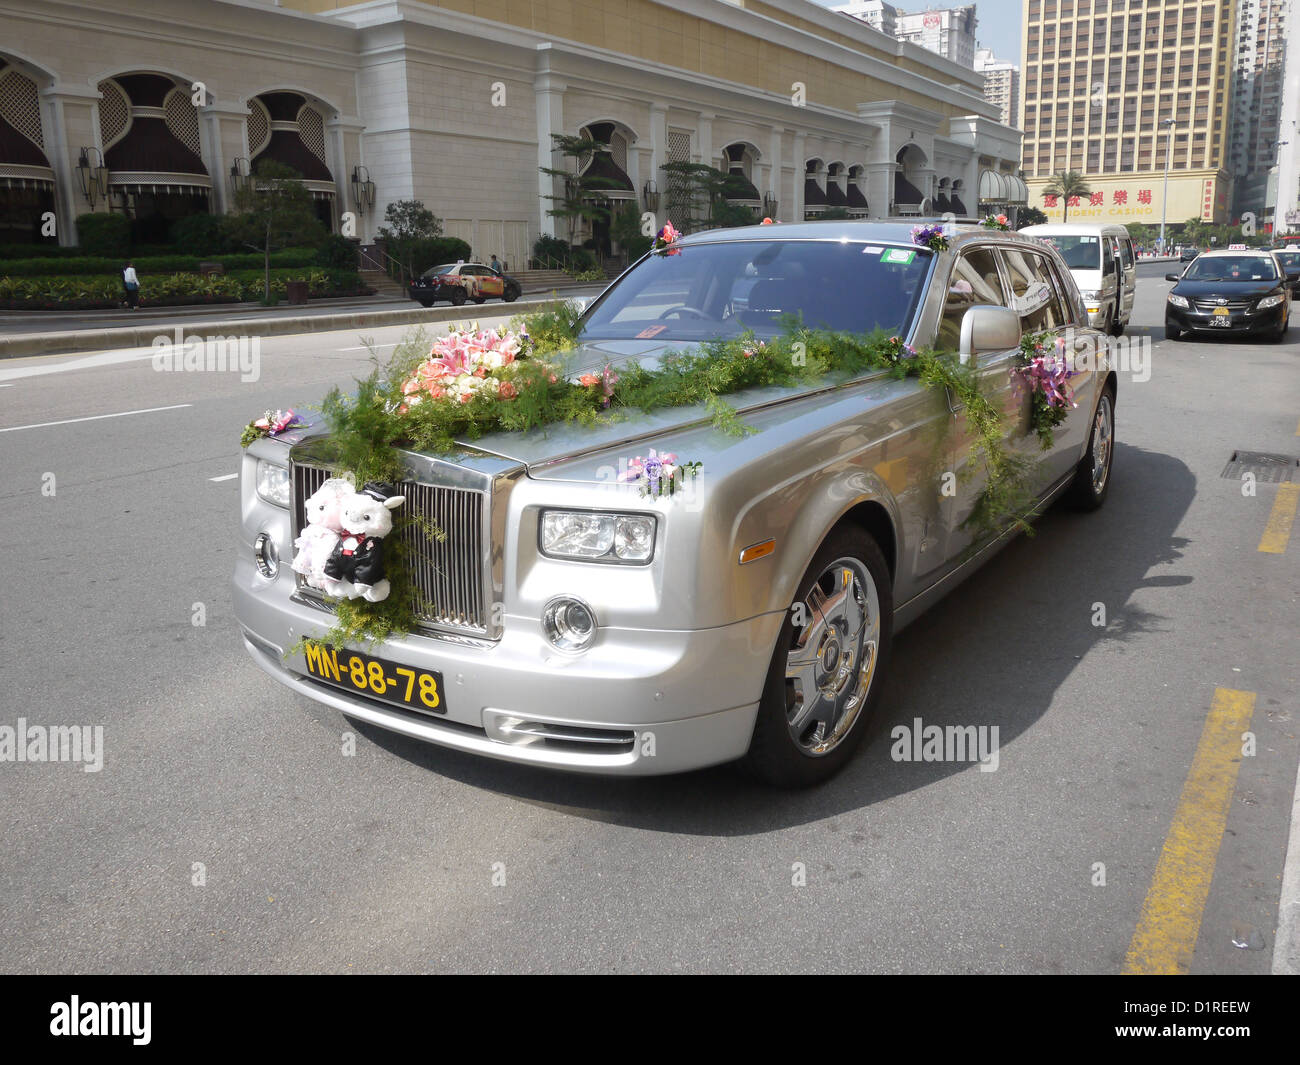 Wedding Car Decoration Royce Rolls Stock Photo 52762049 Alamy